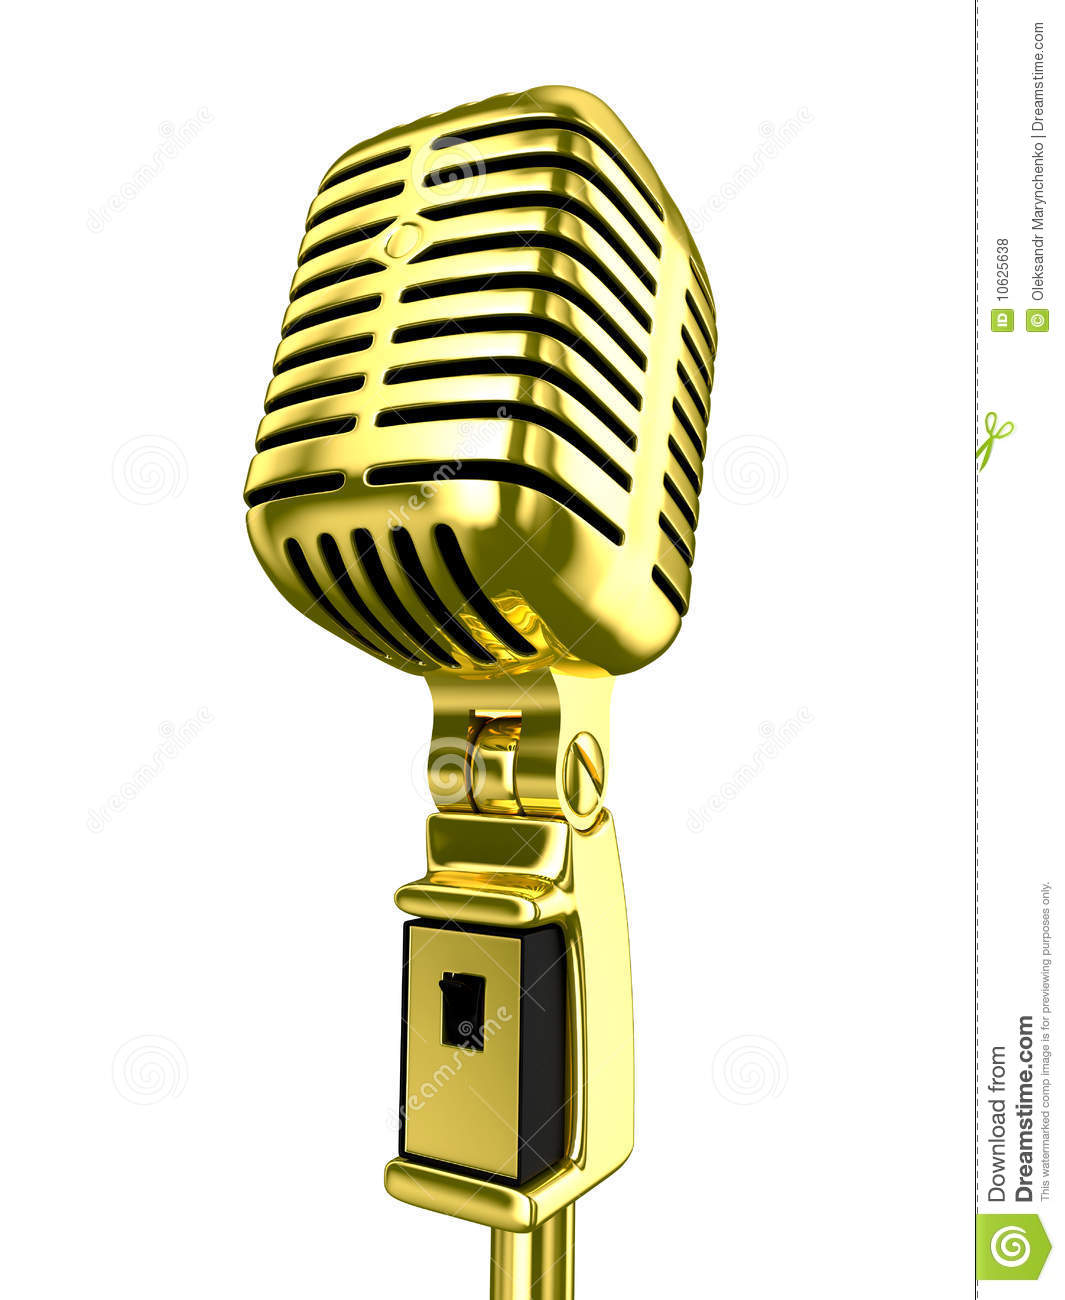 Vintage Microphone Clipart - Clipart Suggest